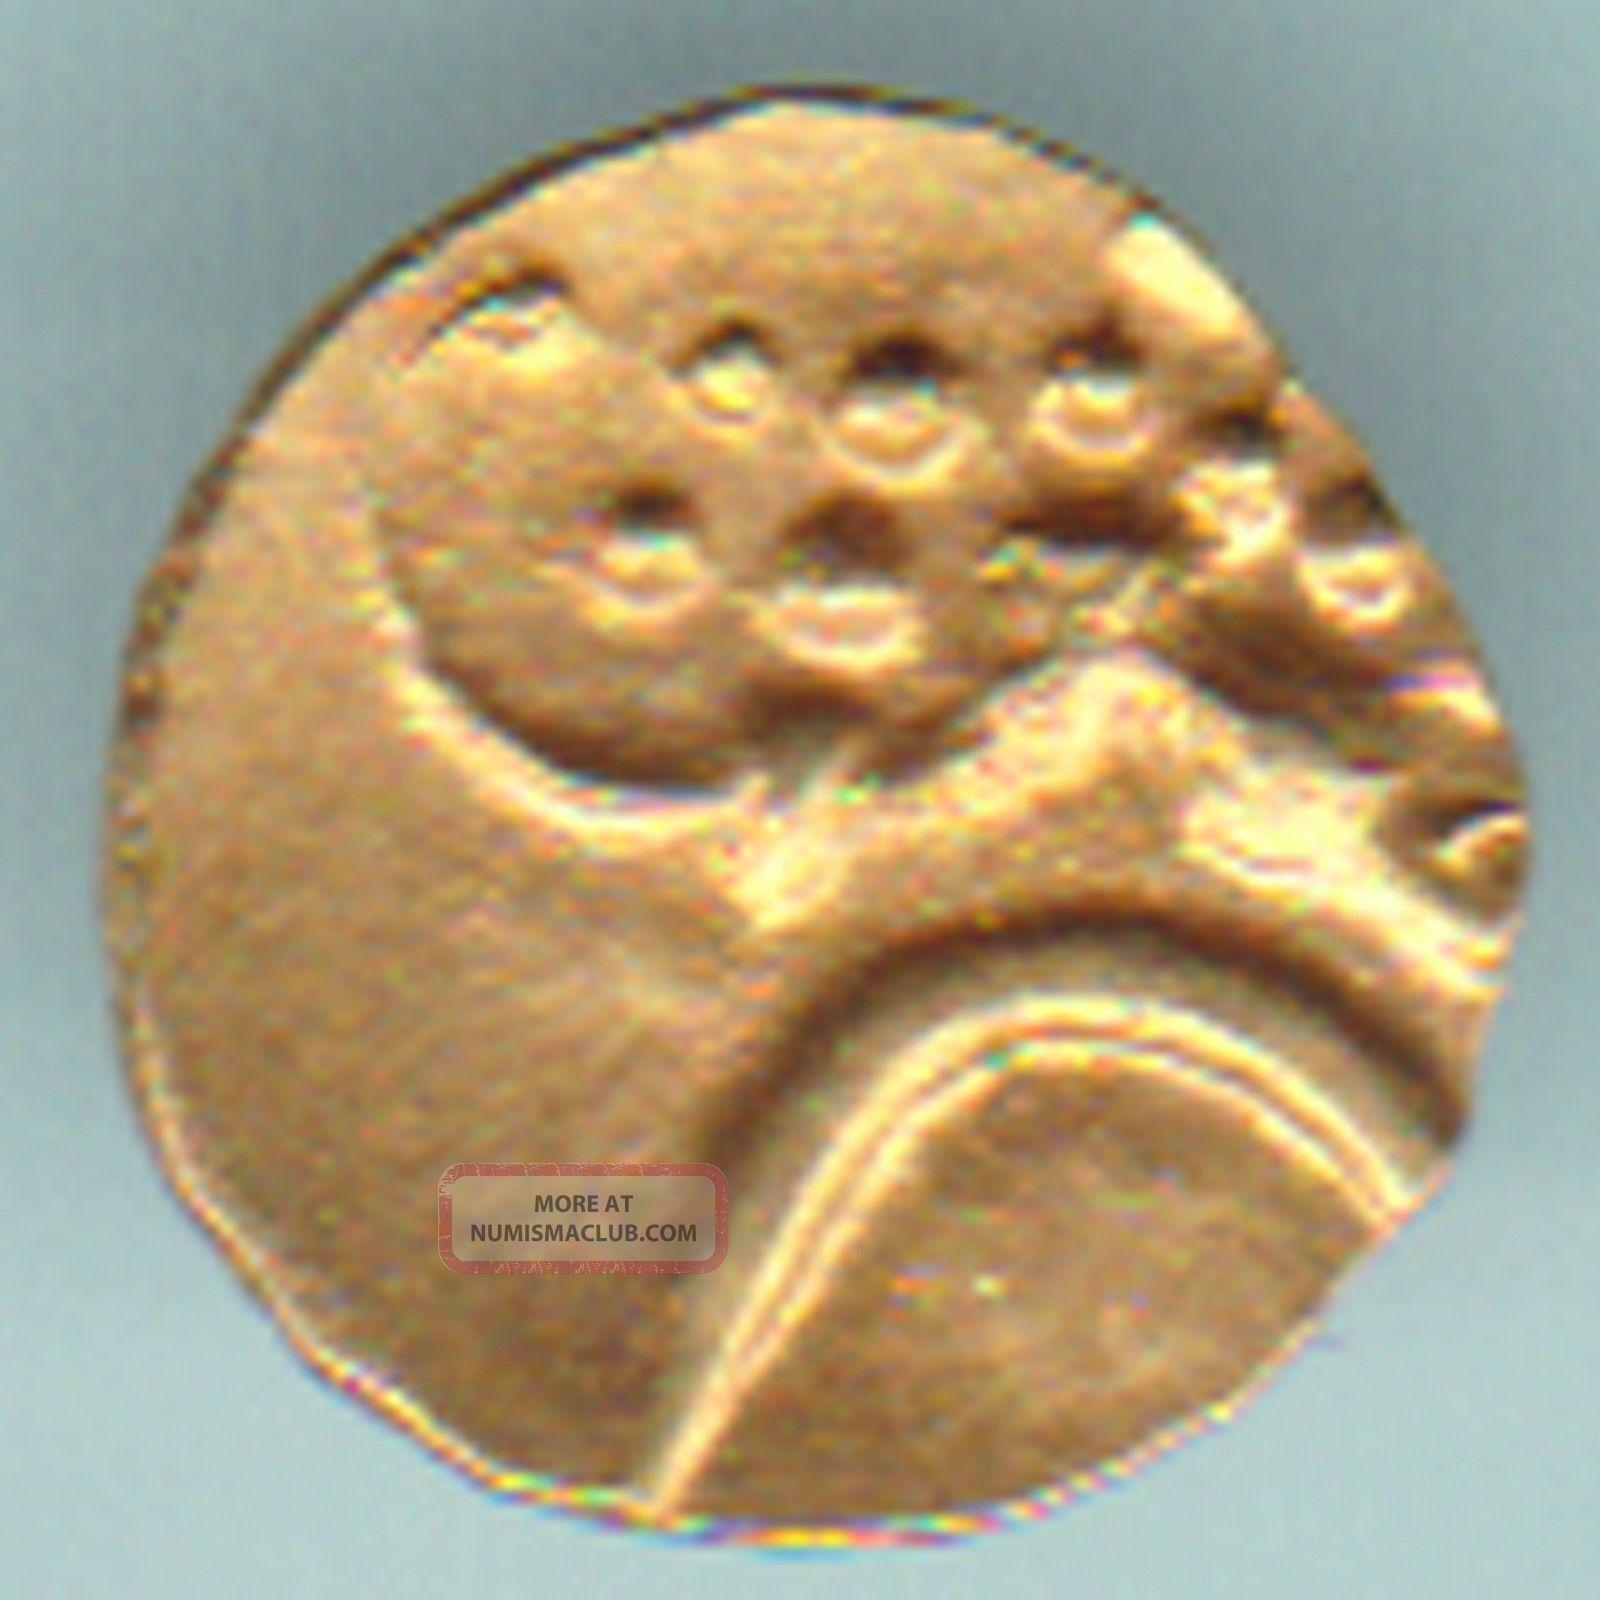 Dutch - Narsimha Pulicat - Gold Fanam - Rarest Variety Small Gold Coin India photo